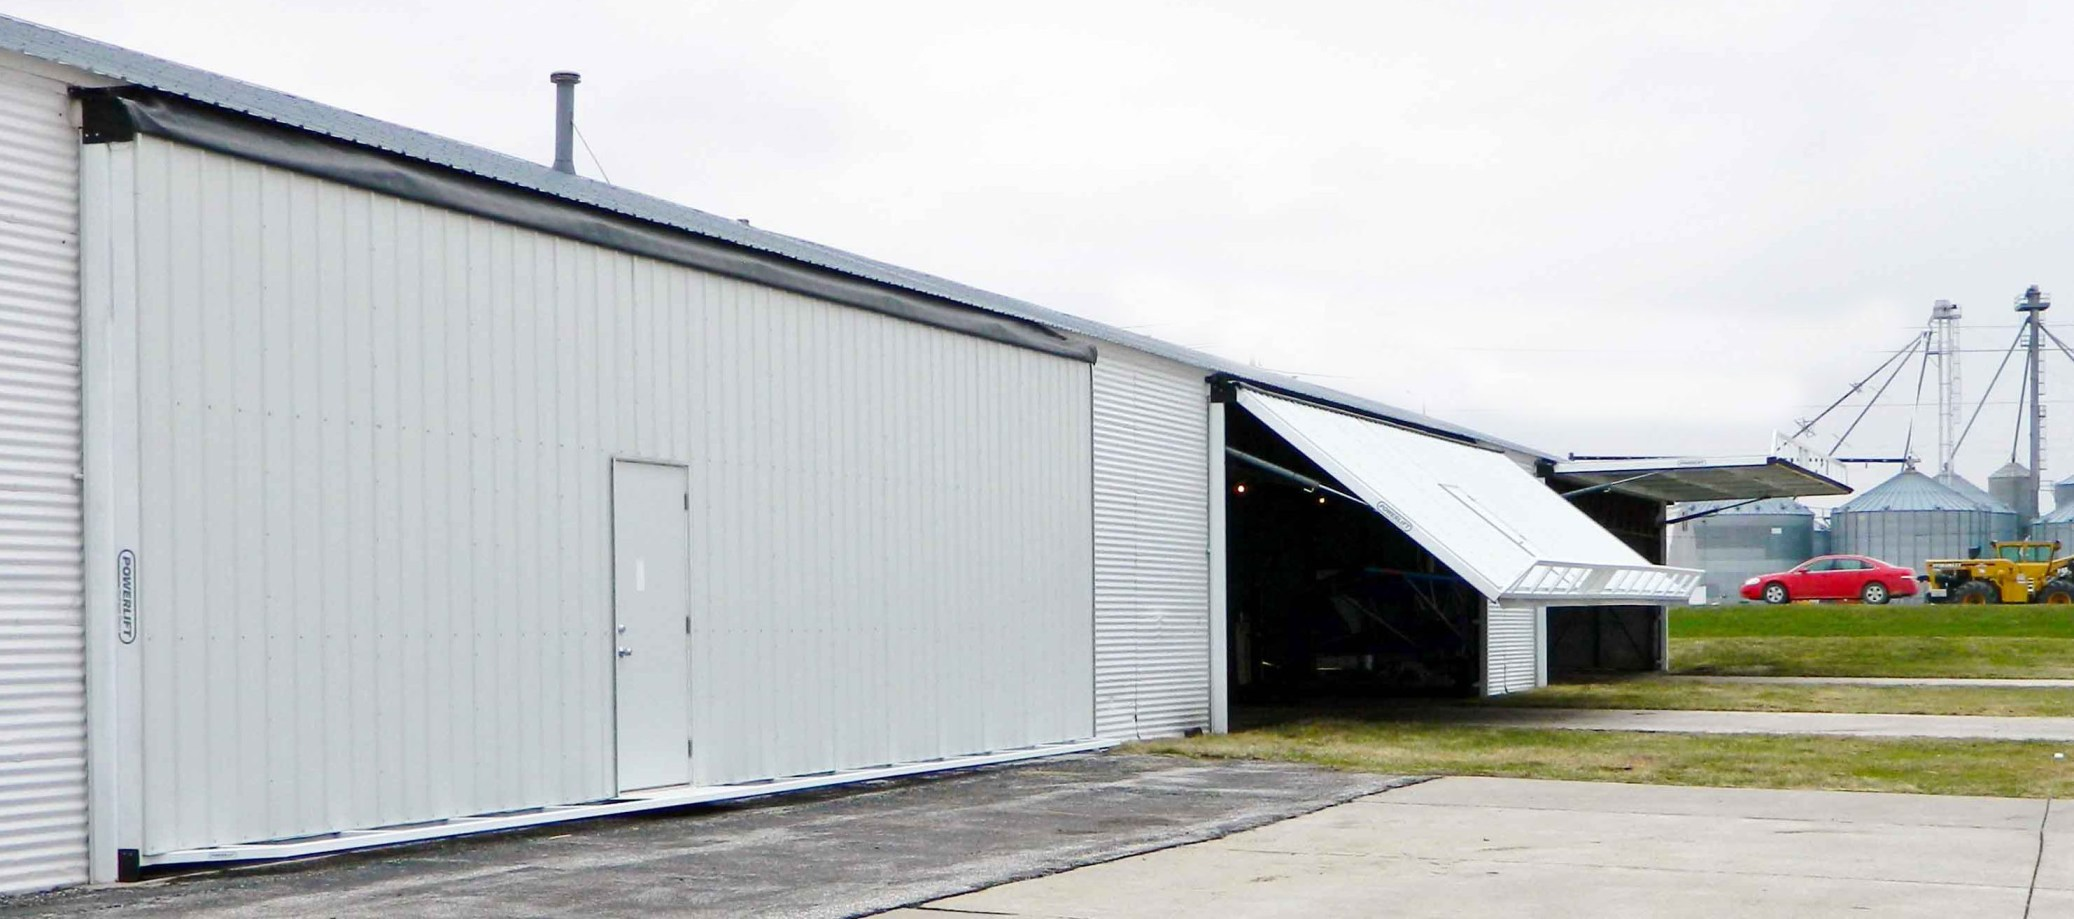 Six retrofit hangar doors replacing old bifolds.